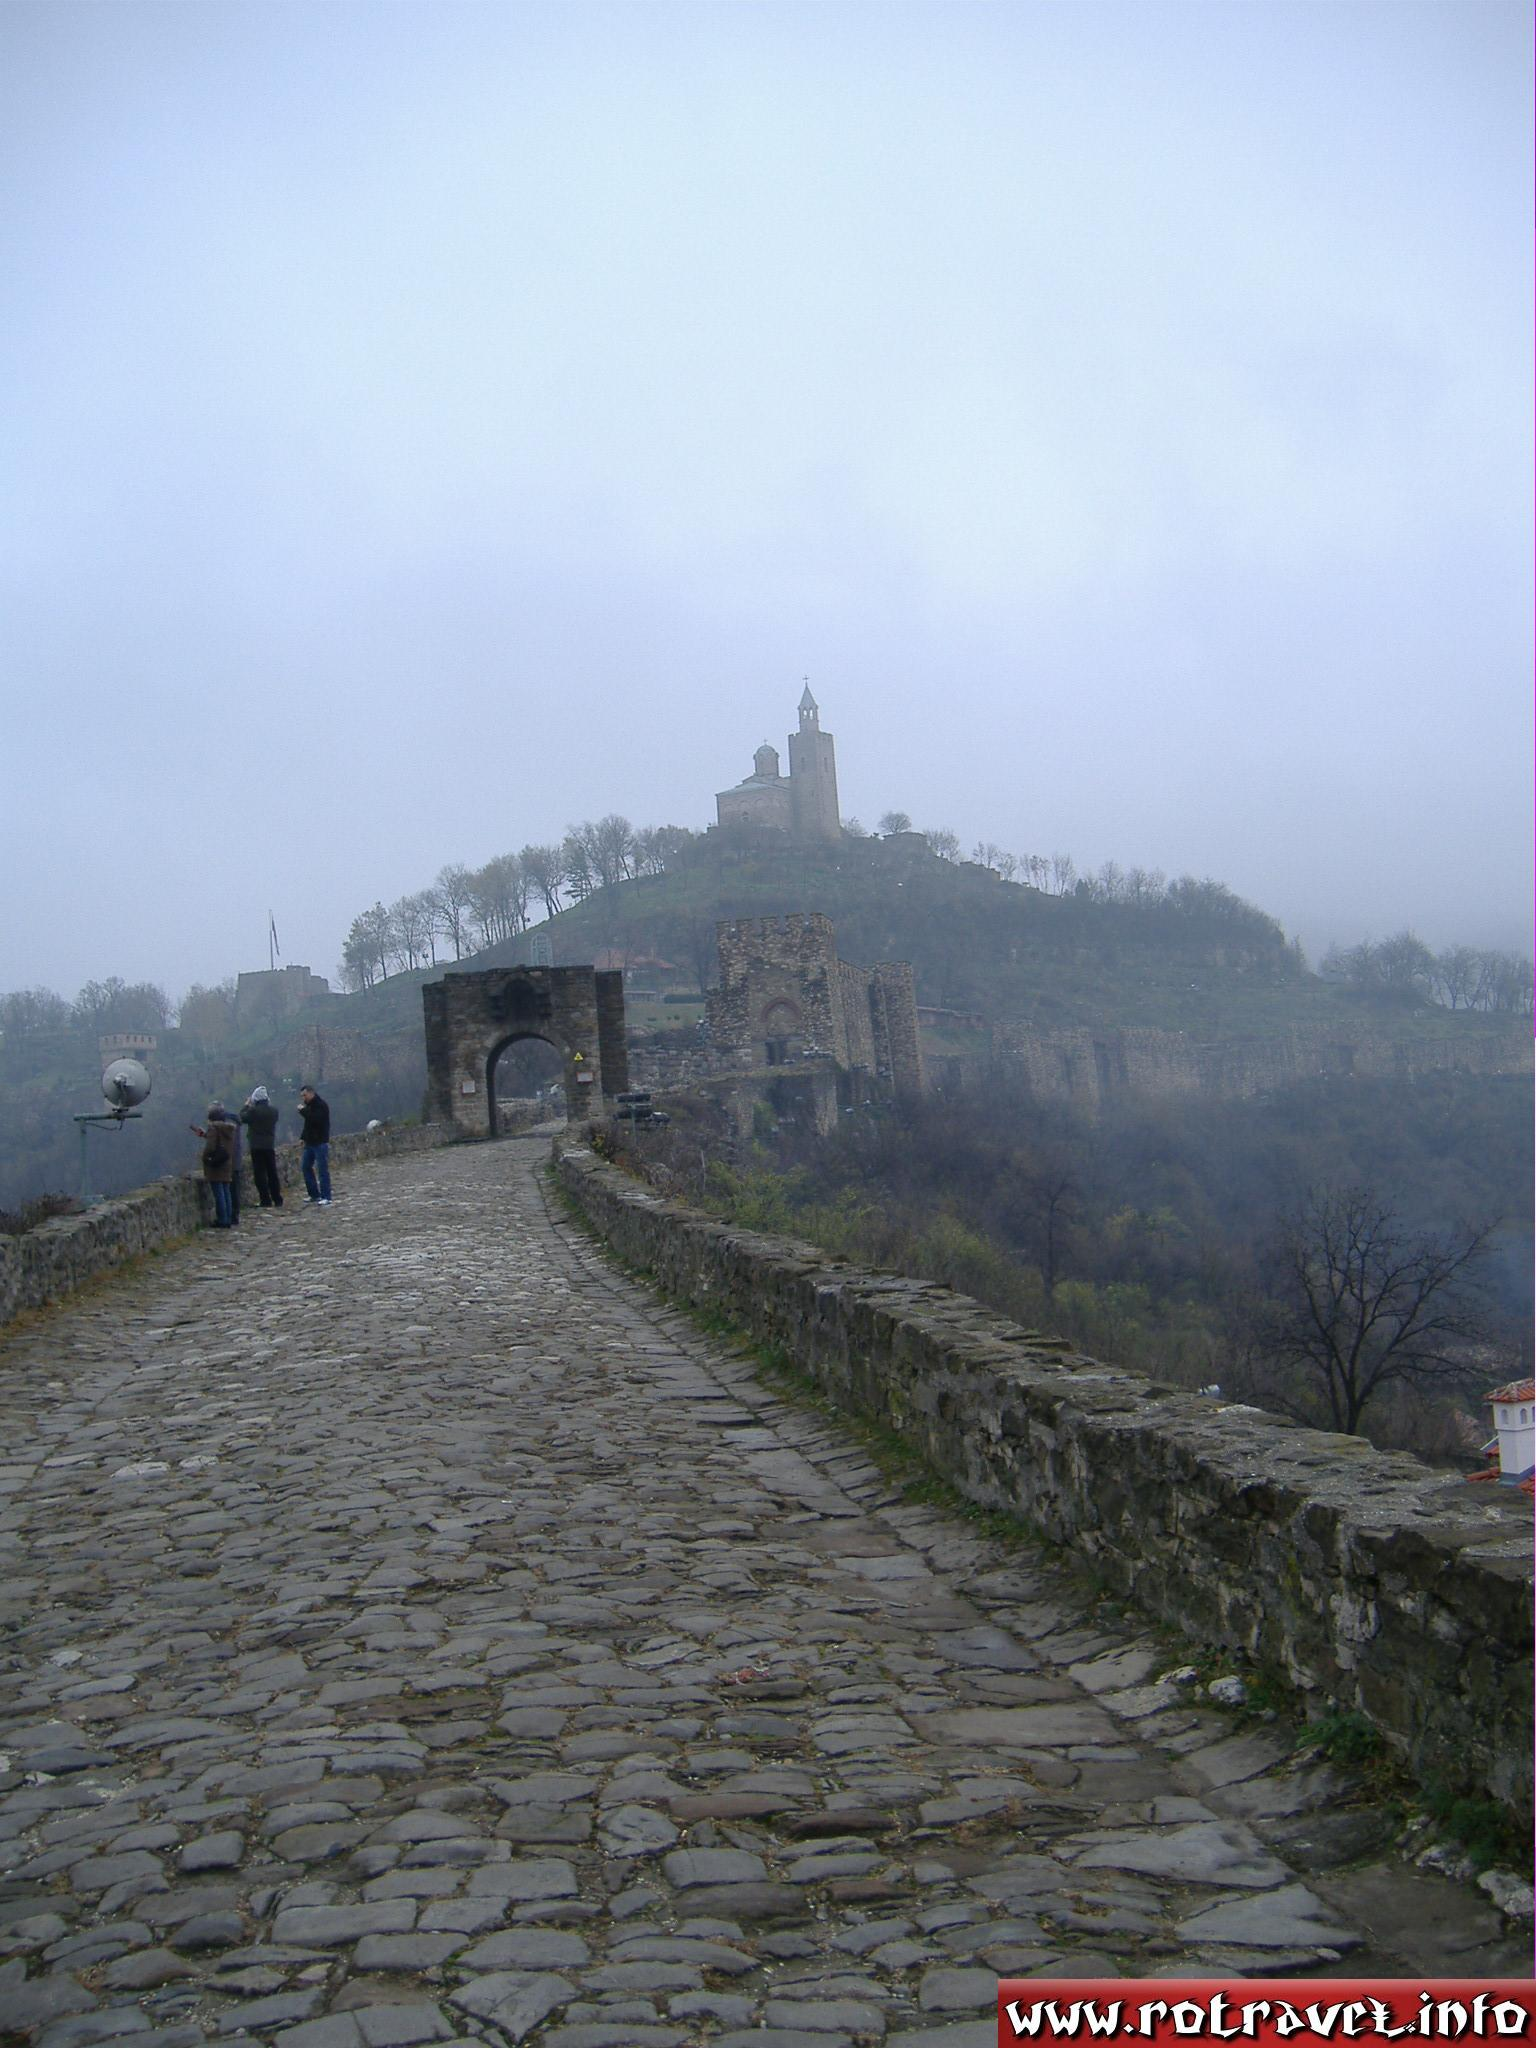 The entrance to Tsarevets